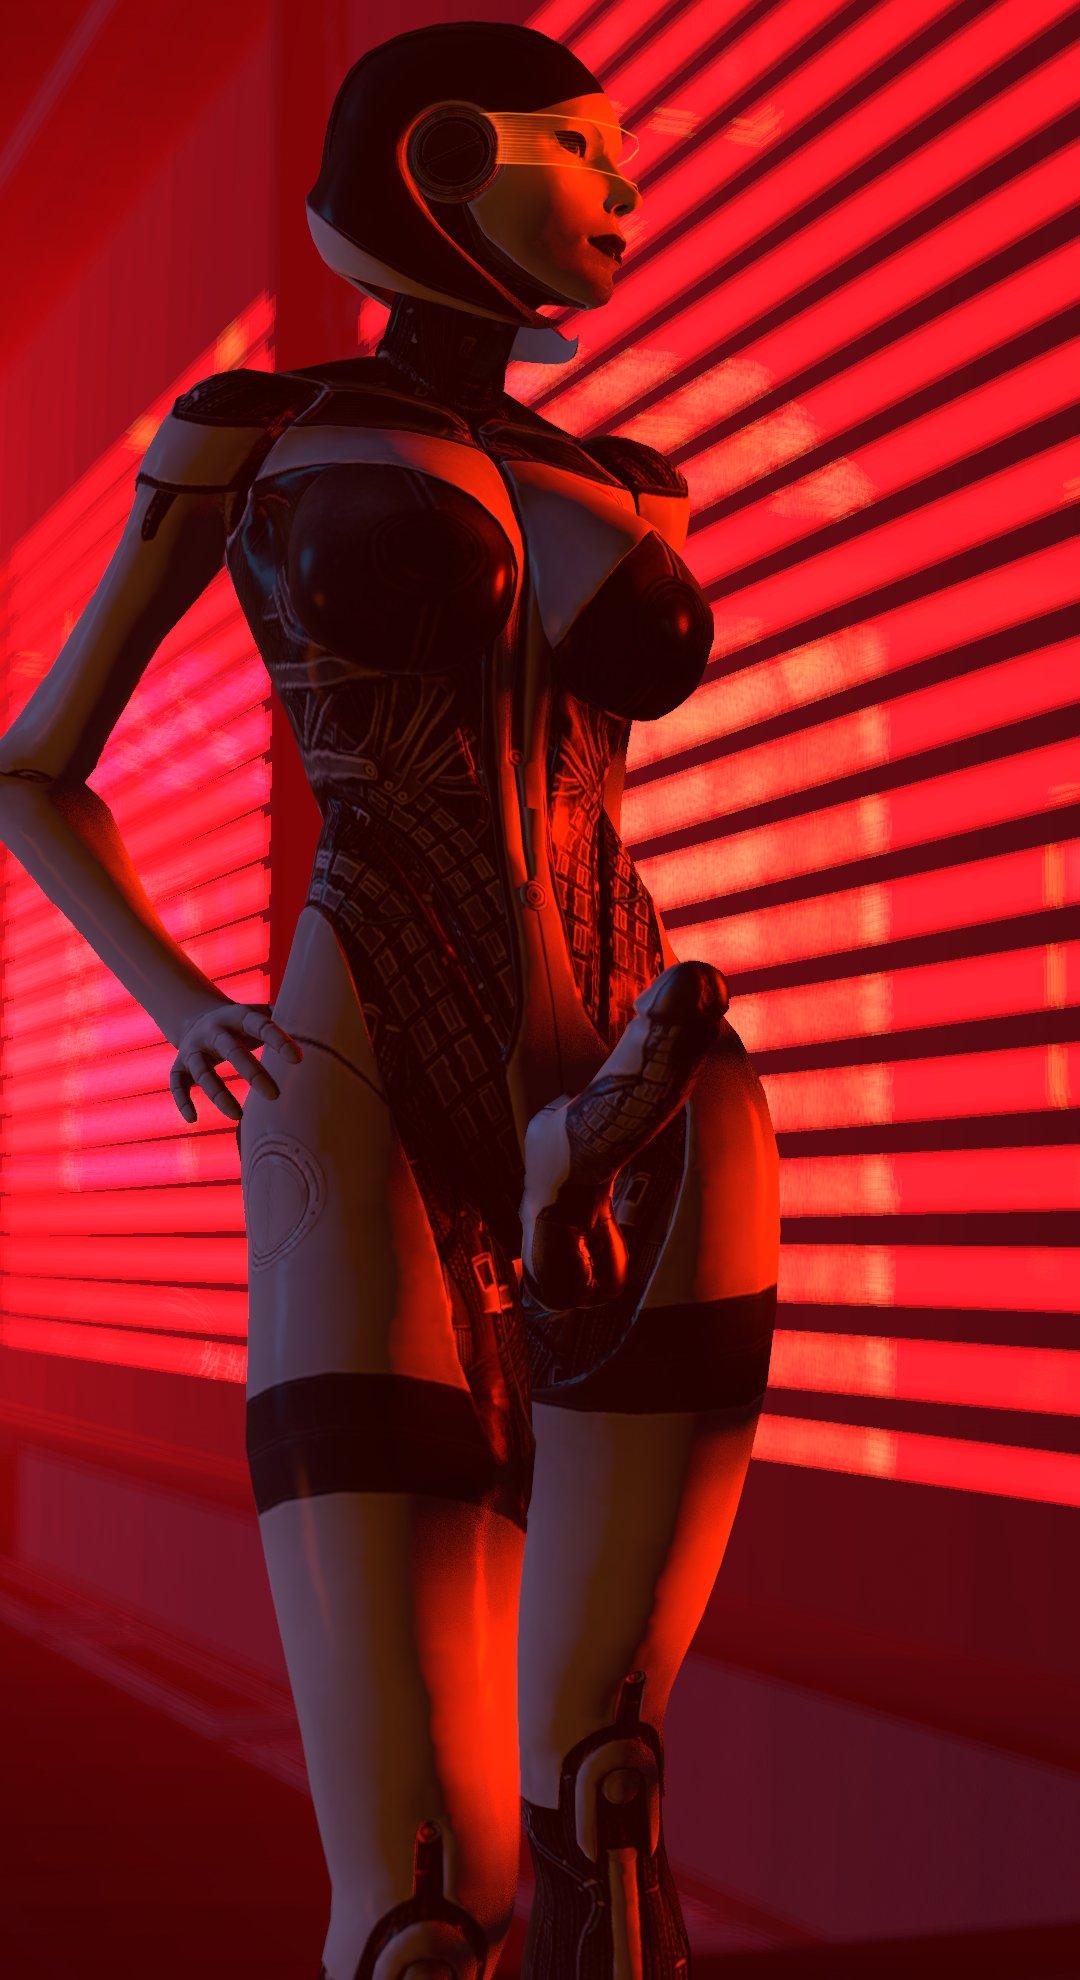 android big_breasts breasts dickgirl edi futa mass_effect mass_effect_3 penis robot source_filmmaker